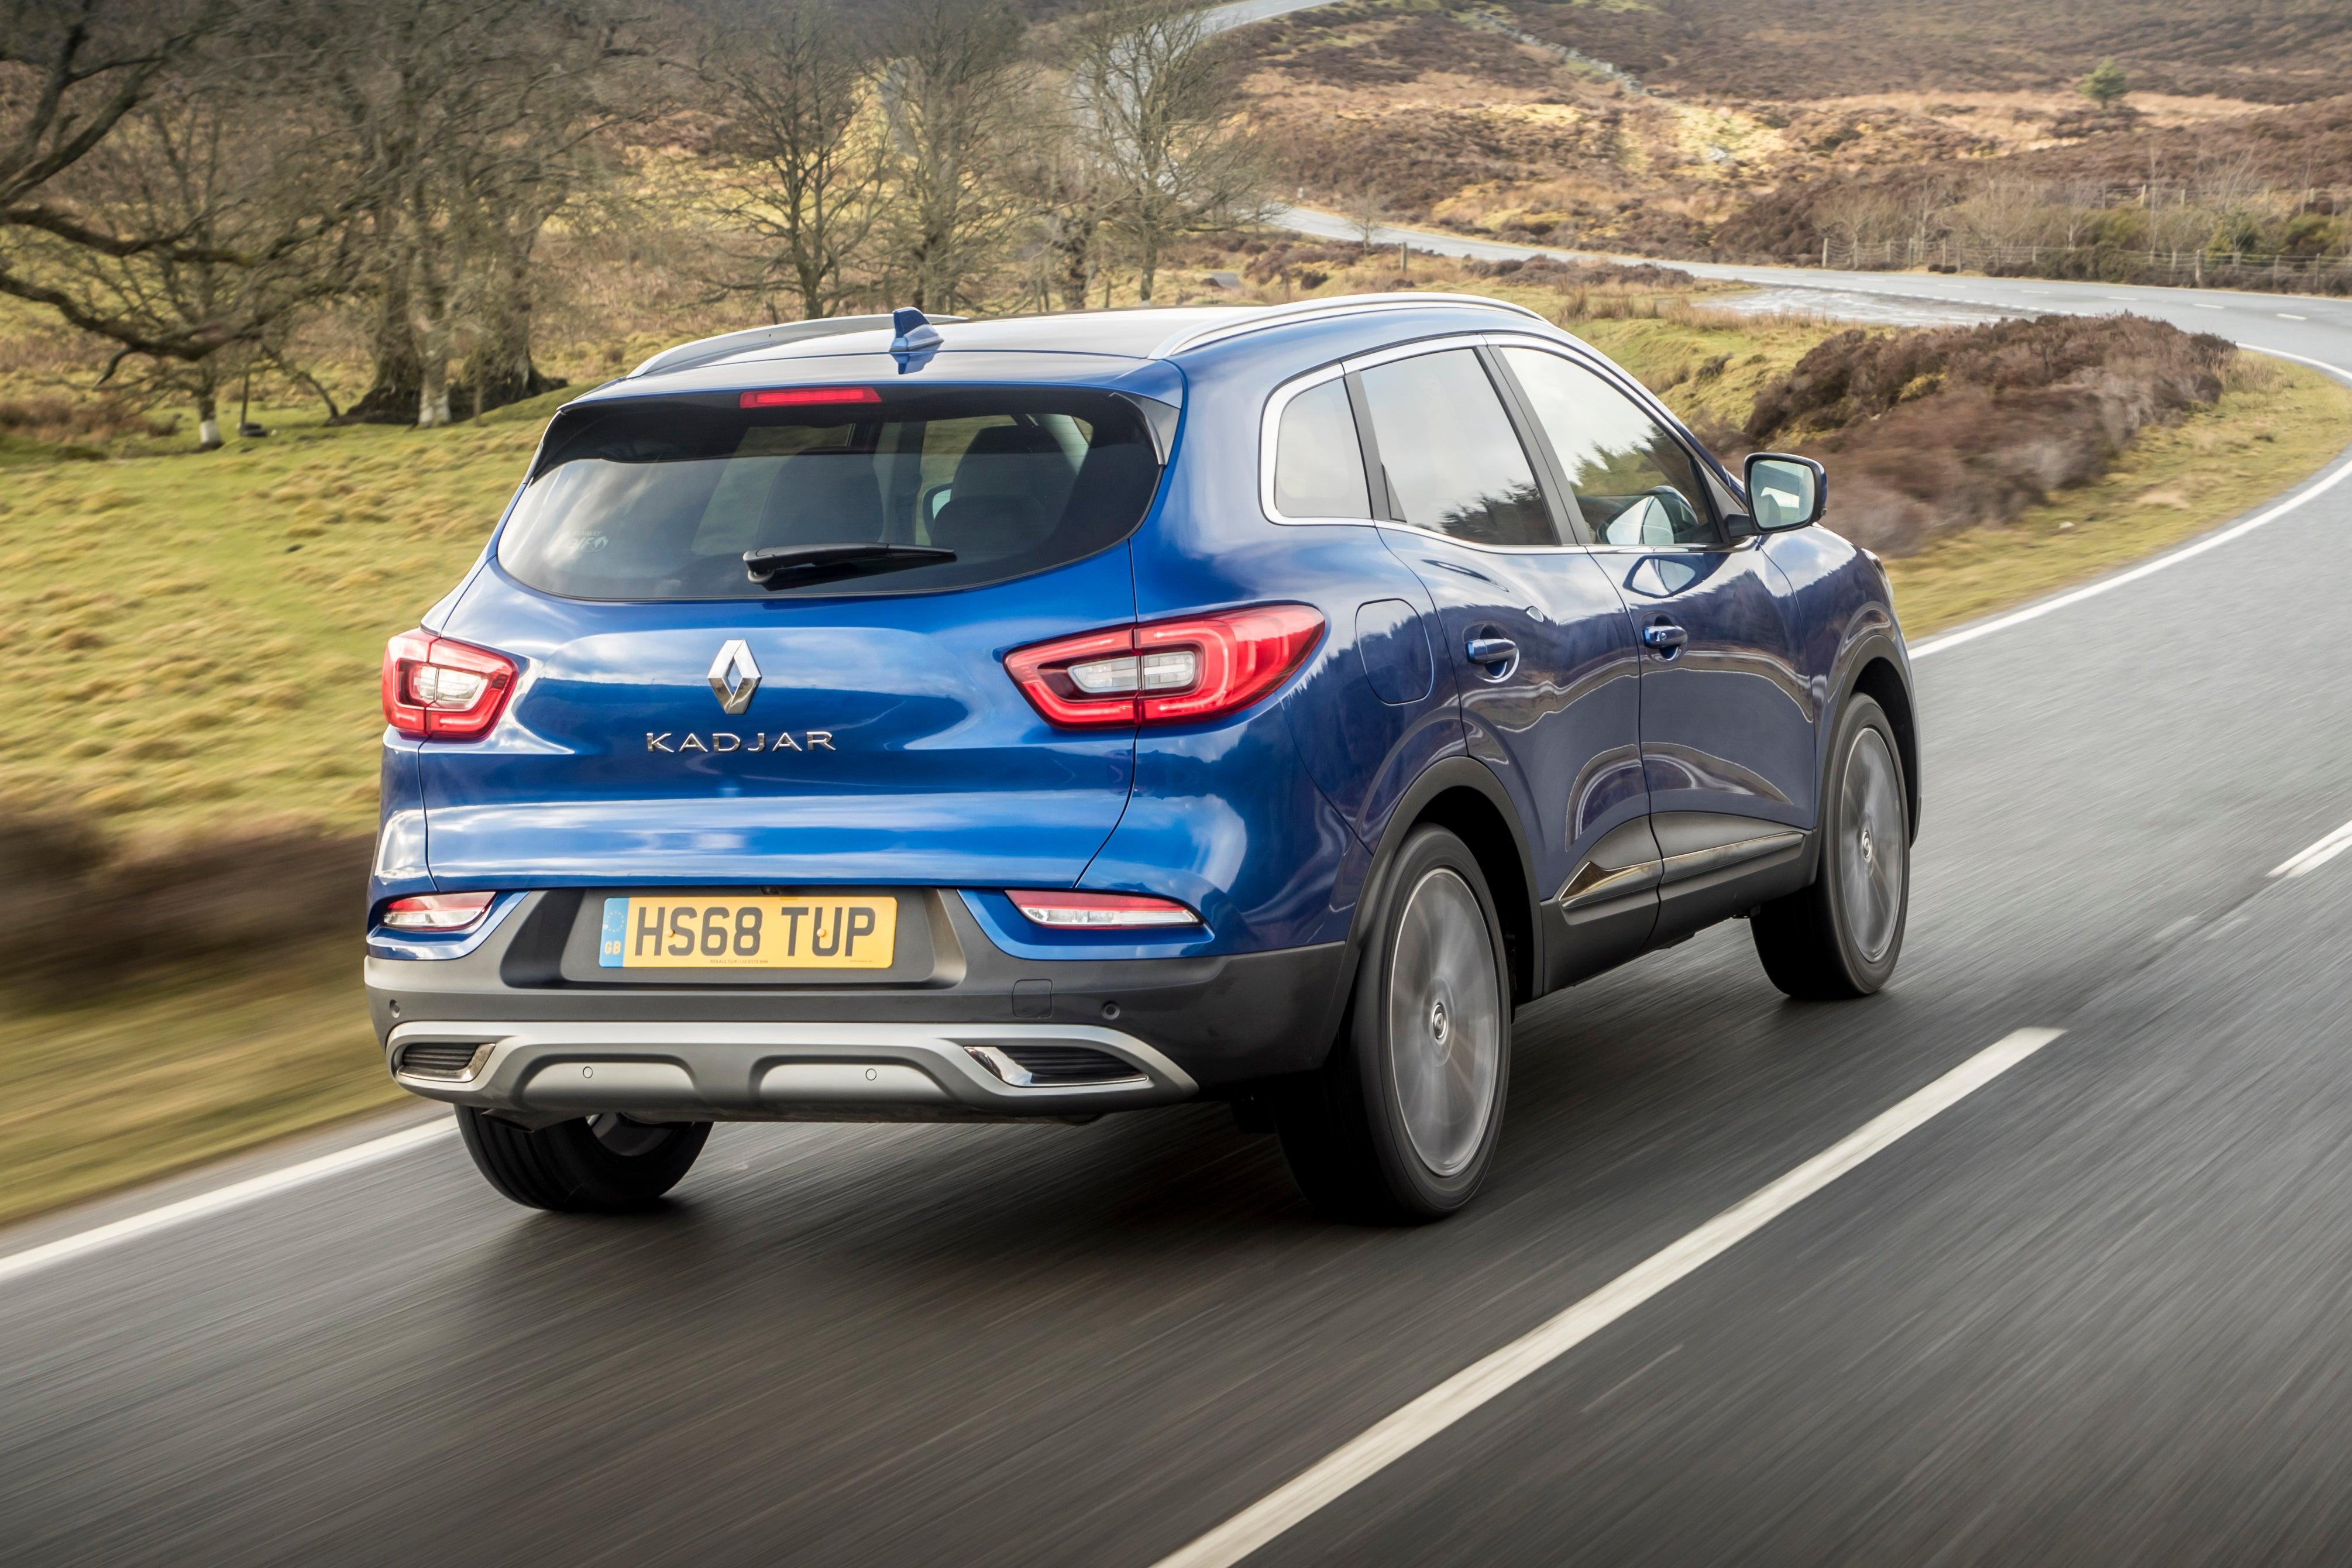 Renault Kadjar Review 2021 Rear View